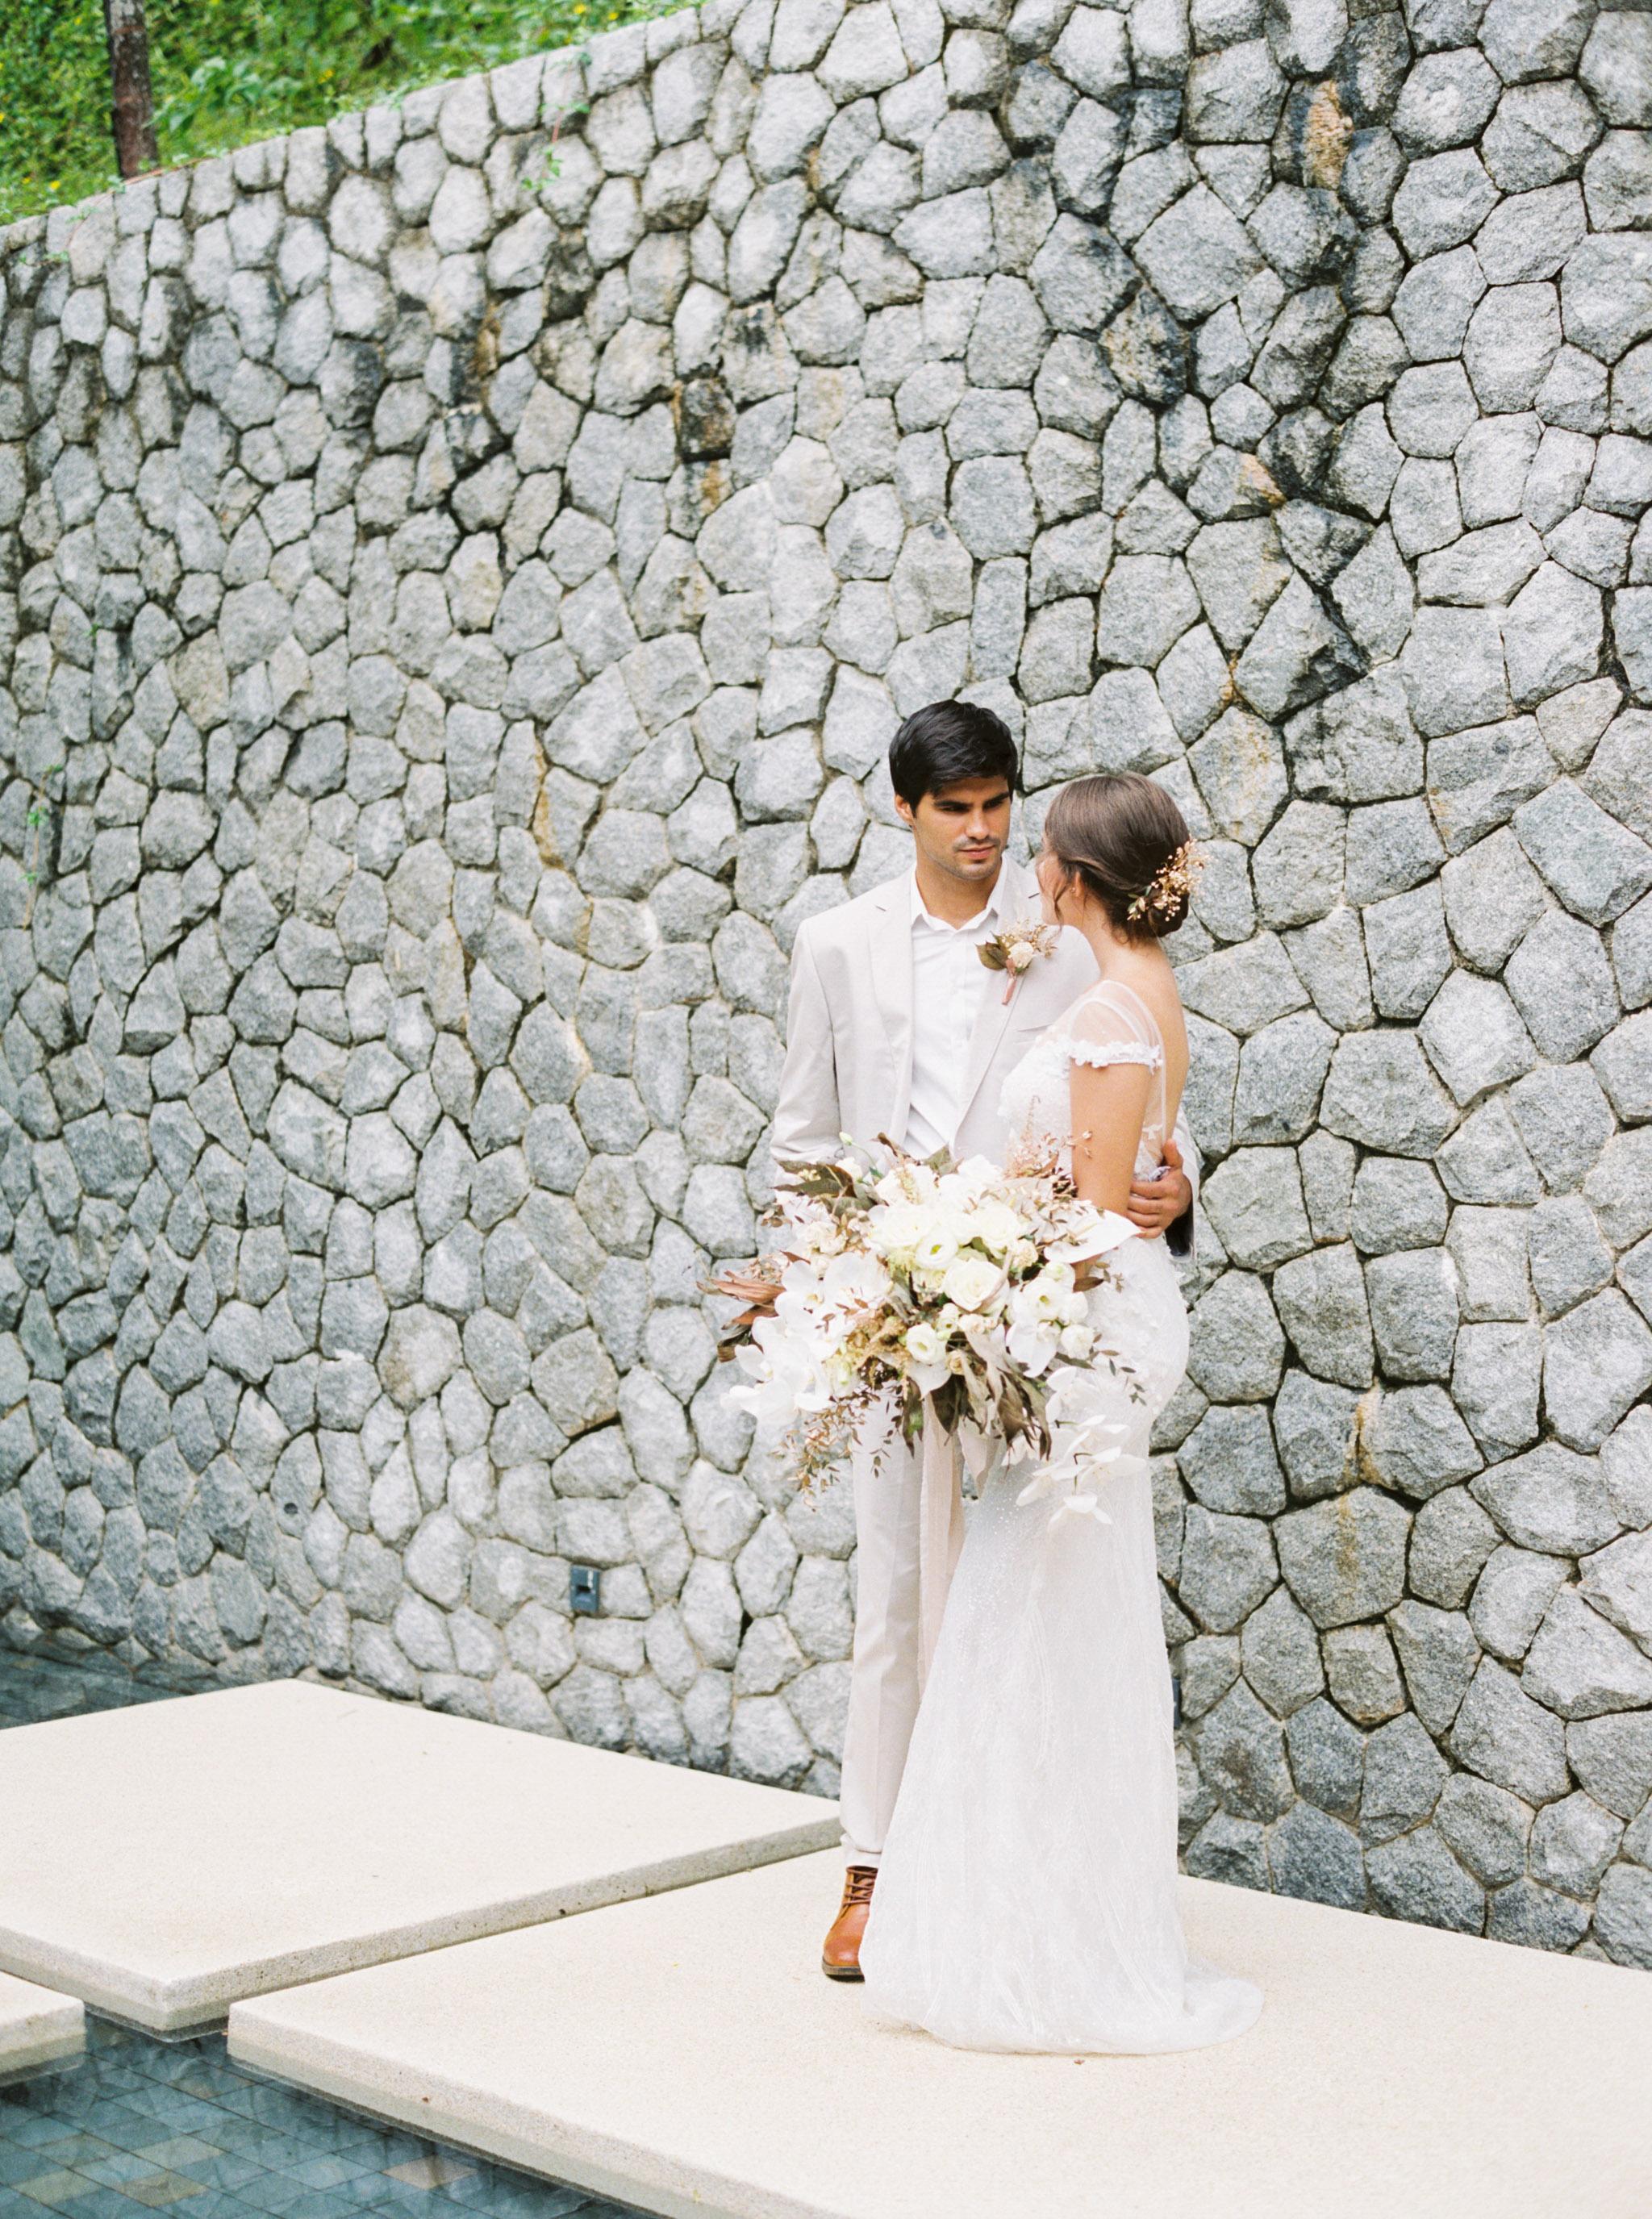 Destination Wedding Phuket Thailand Fine Art Film Photographer Sheri McMahon-00028-28.jpg